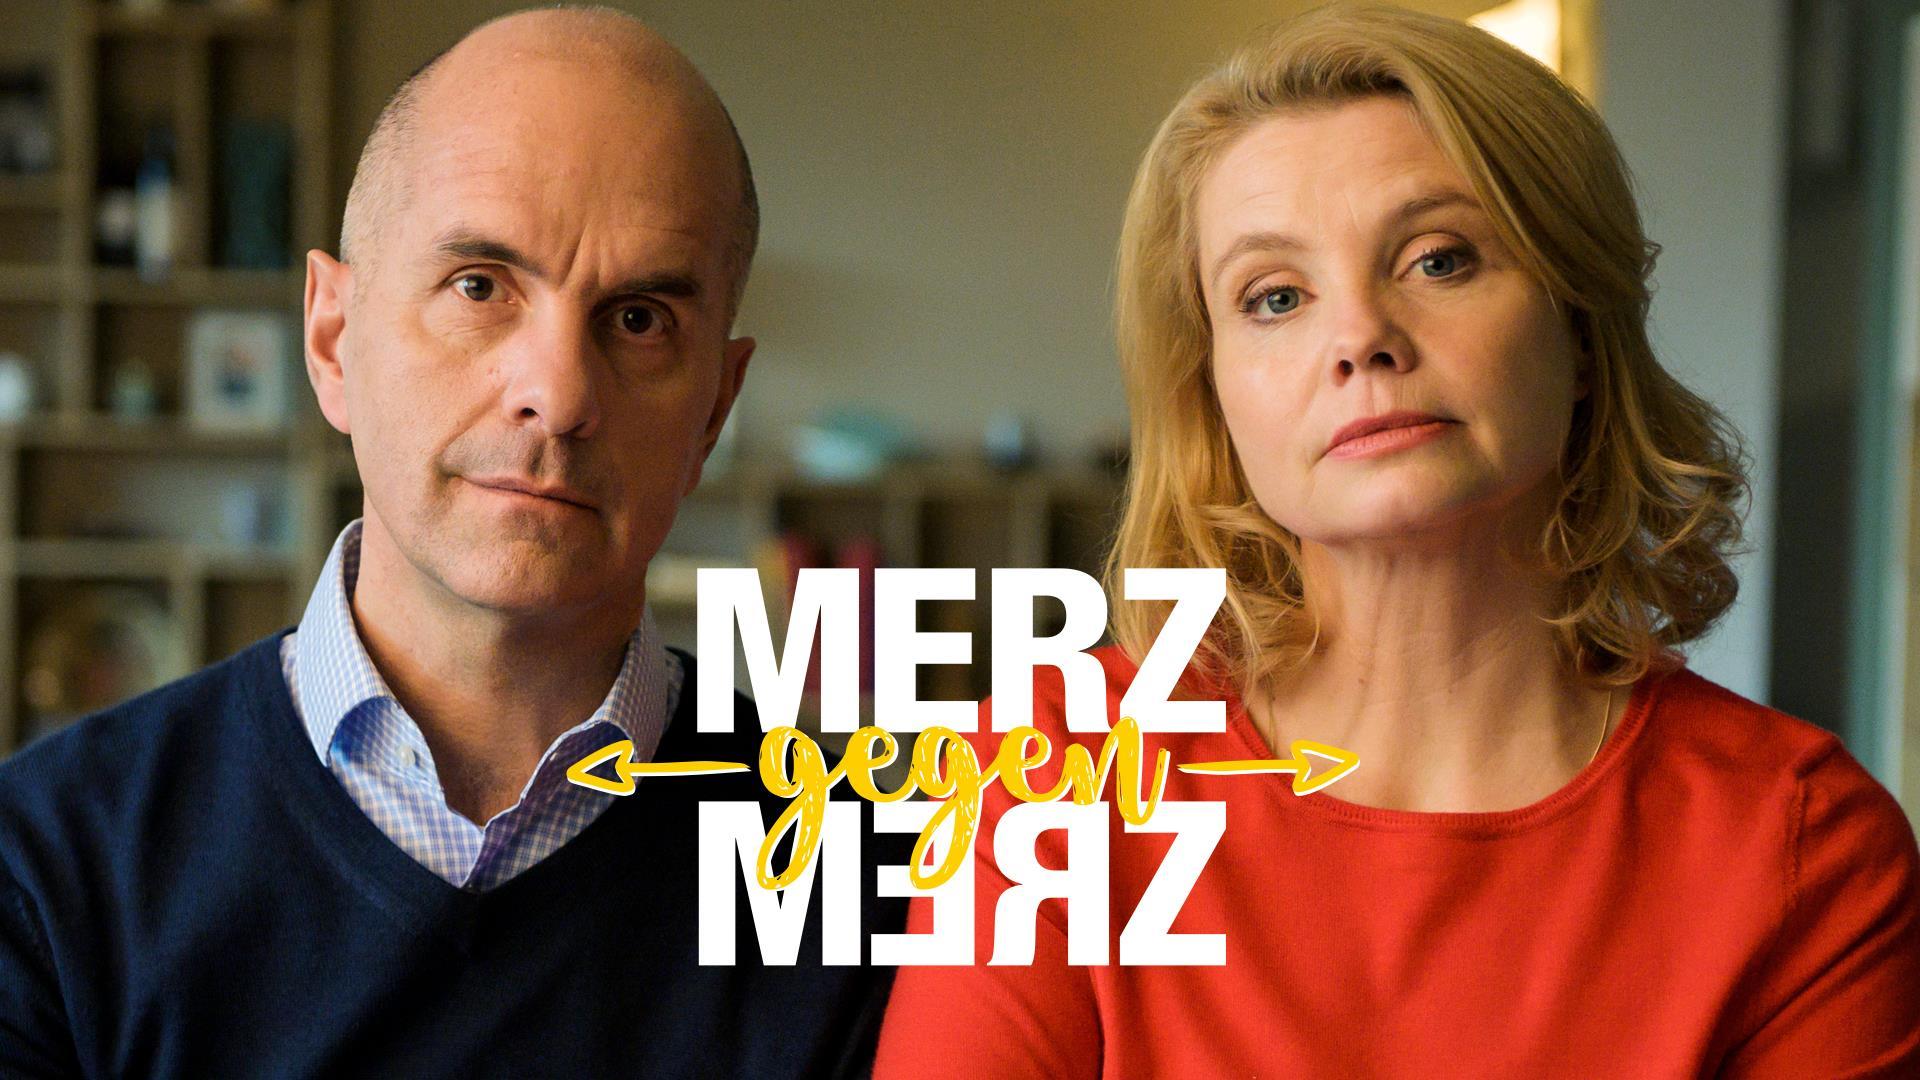 Zdf Mediathek Merz Gegen Merz